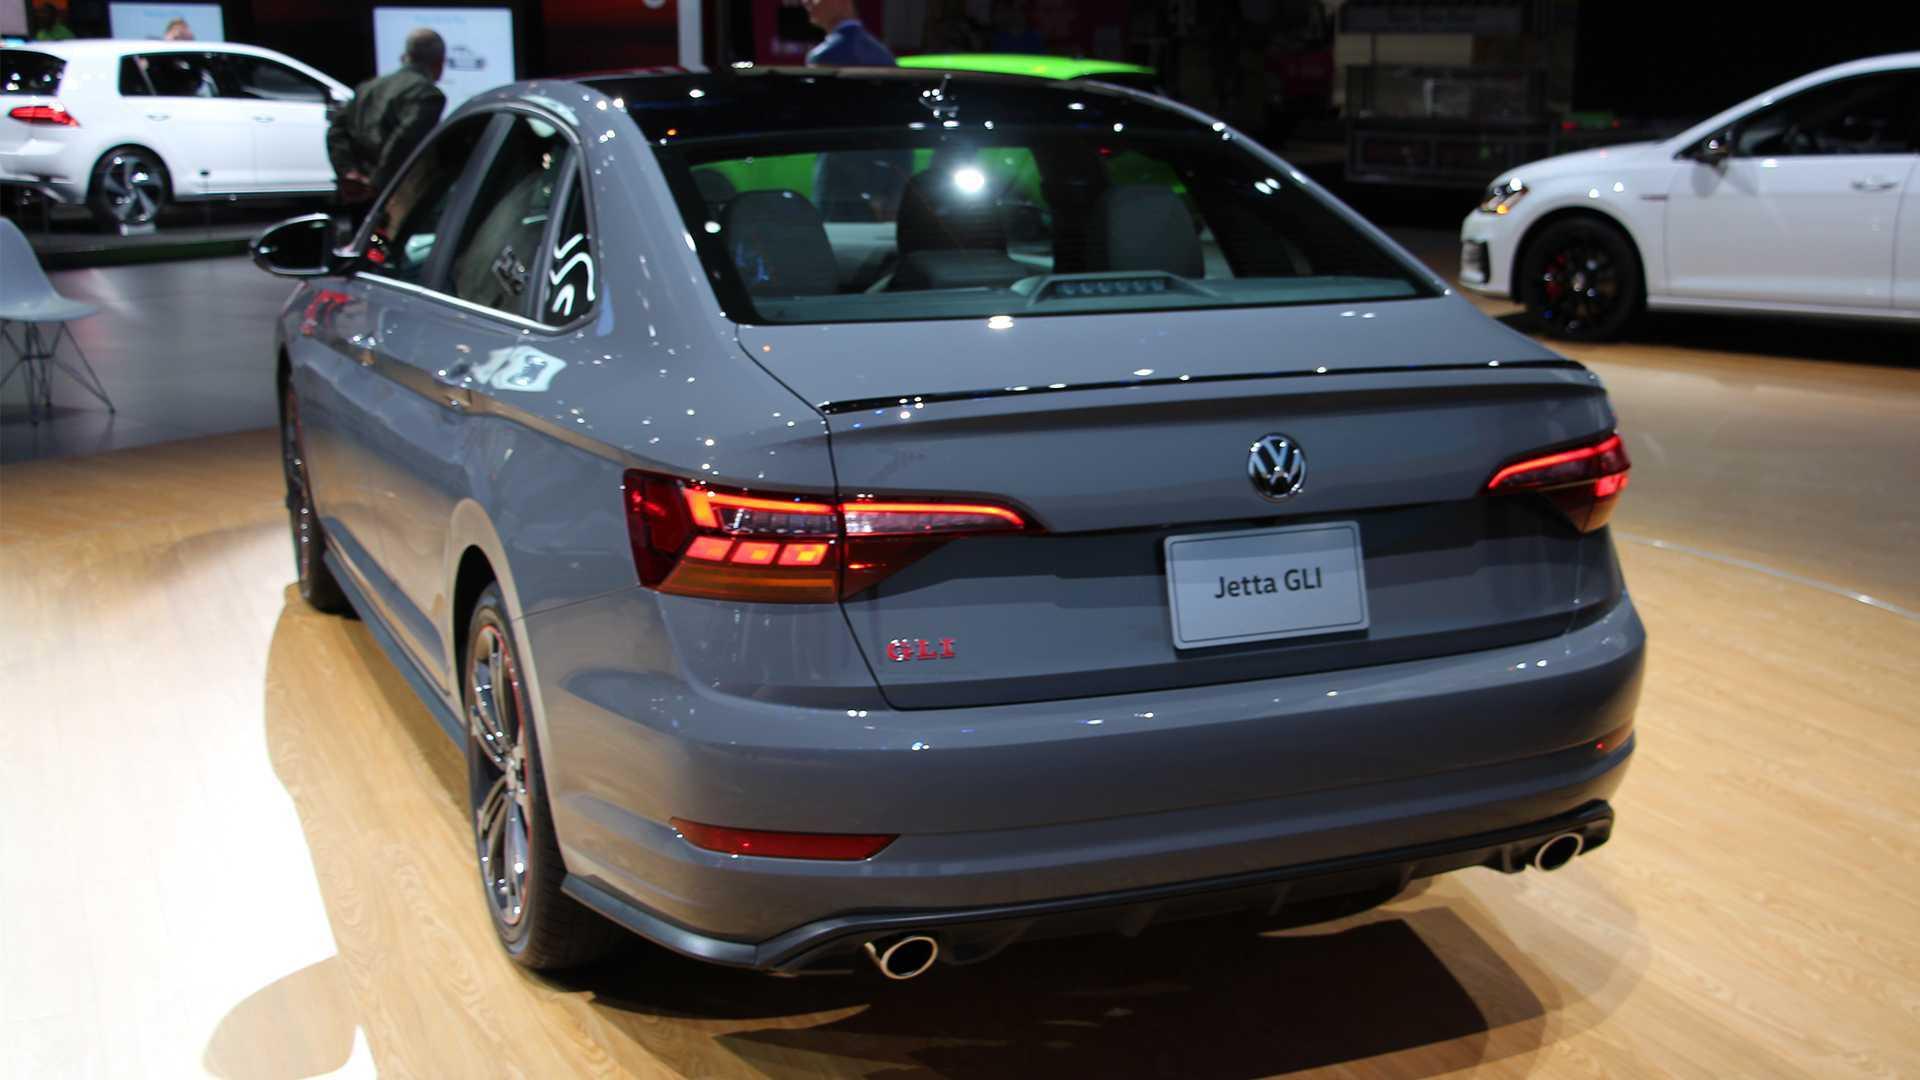 2019 Volkswagen Jetta GLI Storms Into Chicago With GTI Power